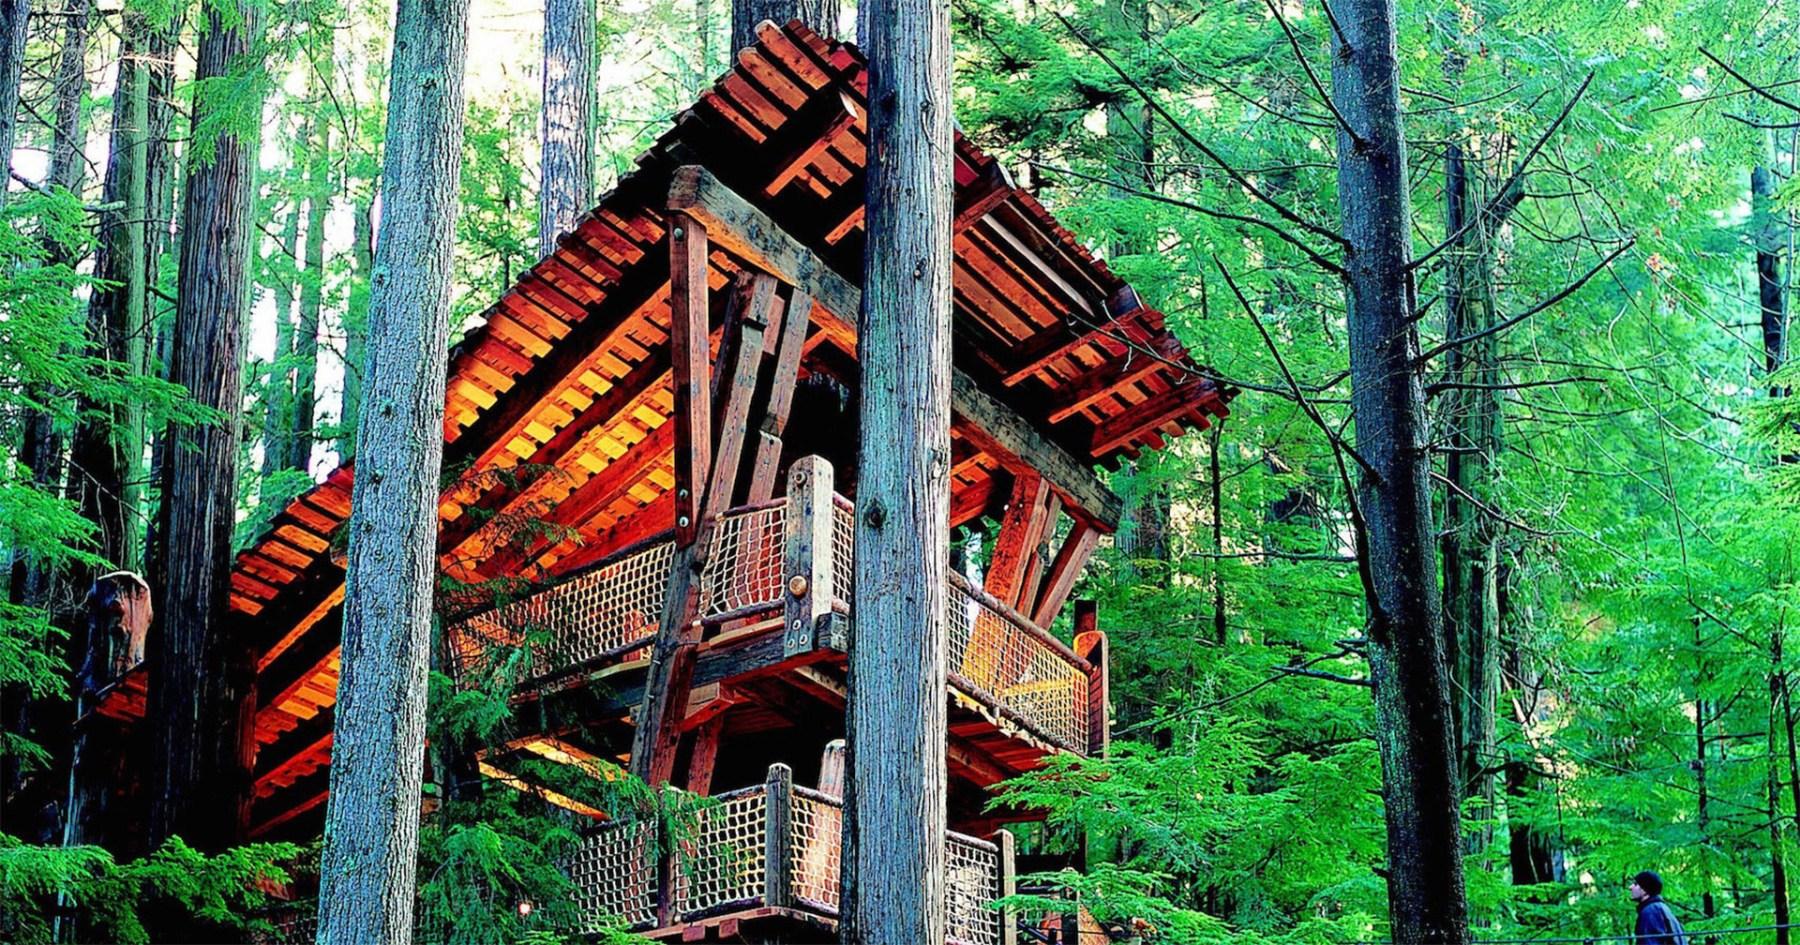 So You Wanna Sleep in a Five-Star Treehouse…